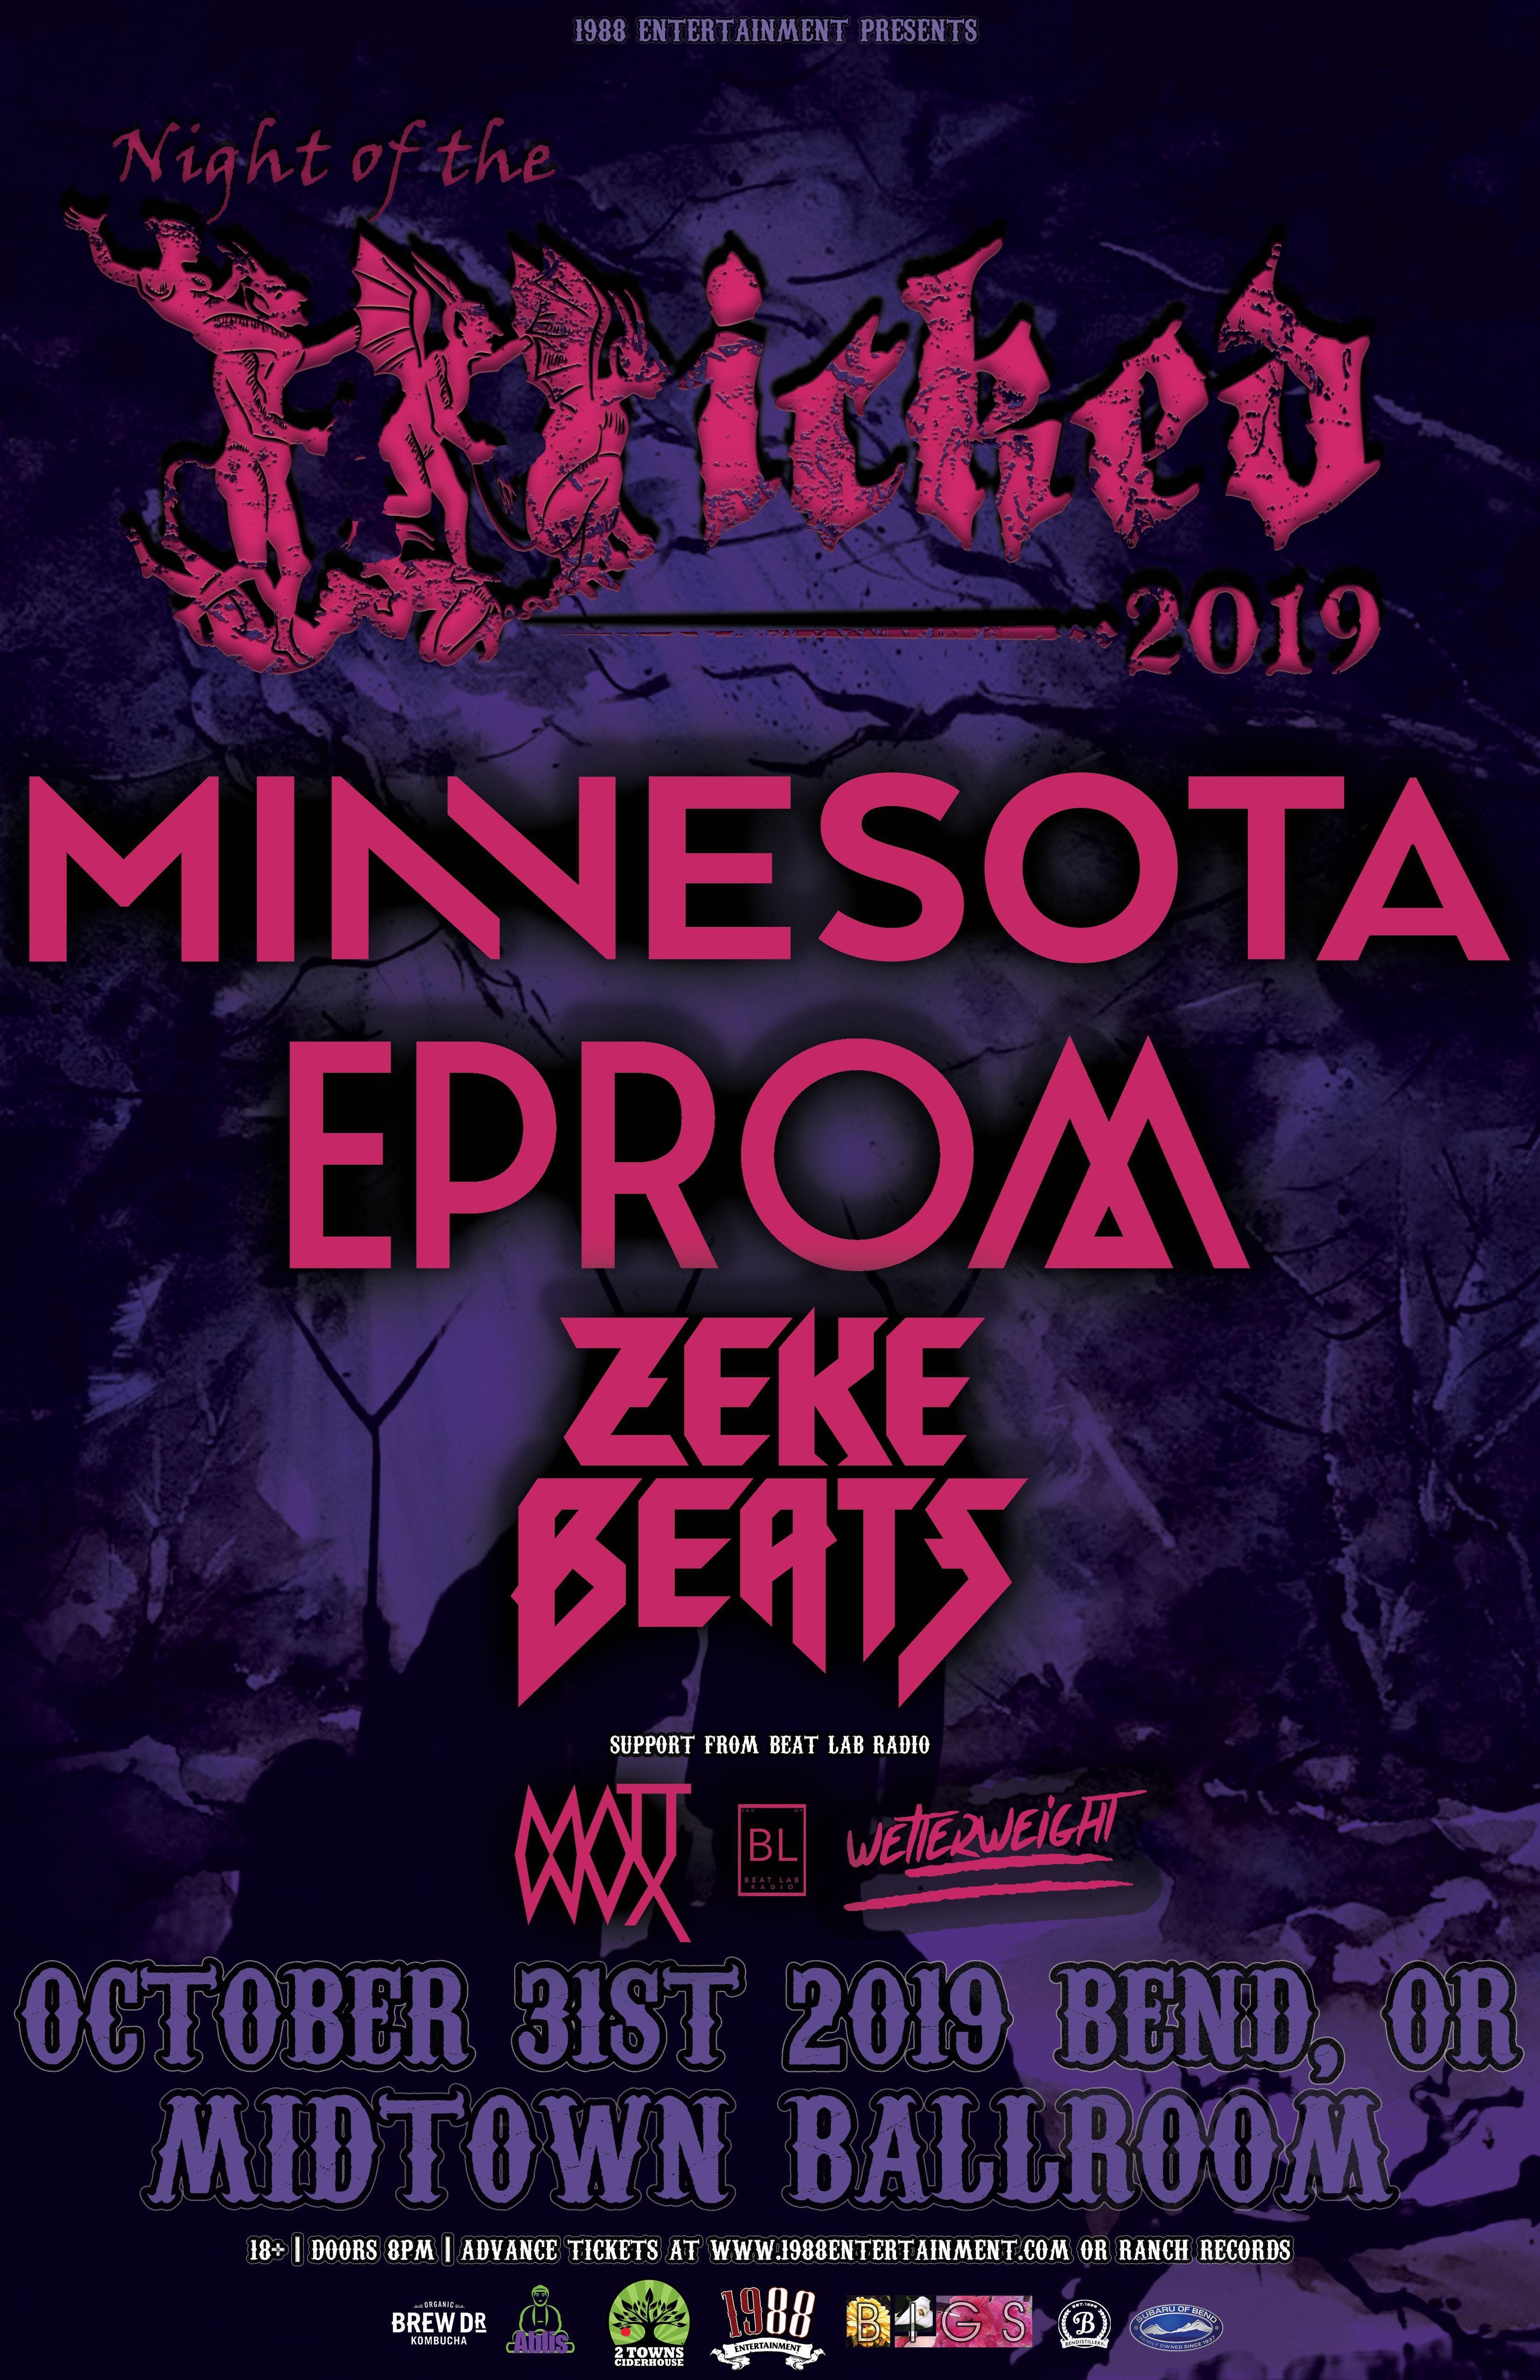 WICKED 2019 Featuring Minnesota, Eprom, ZEKE BEATS,  Matt Waxx & Welterweight